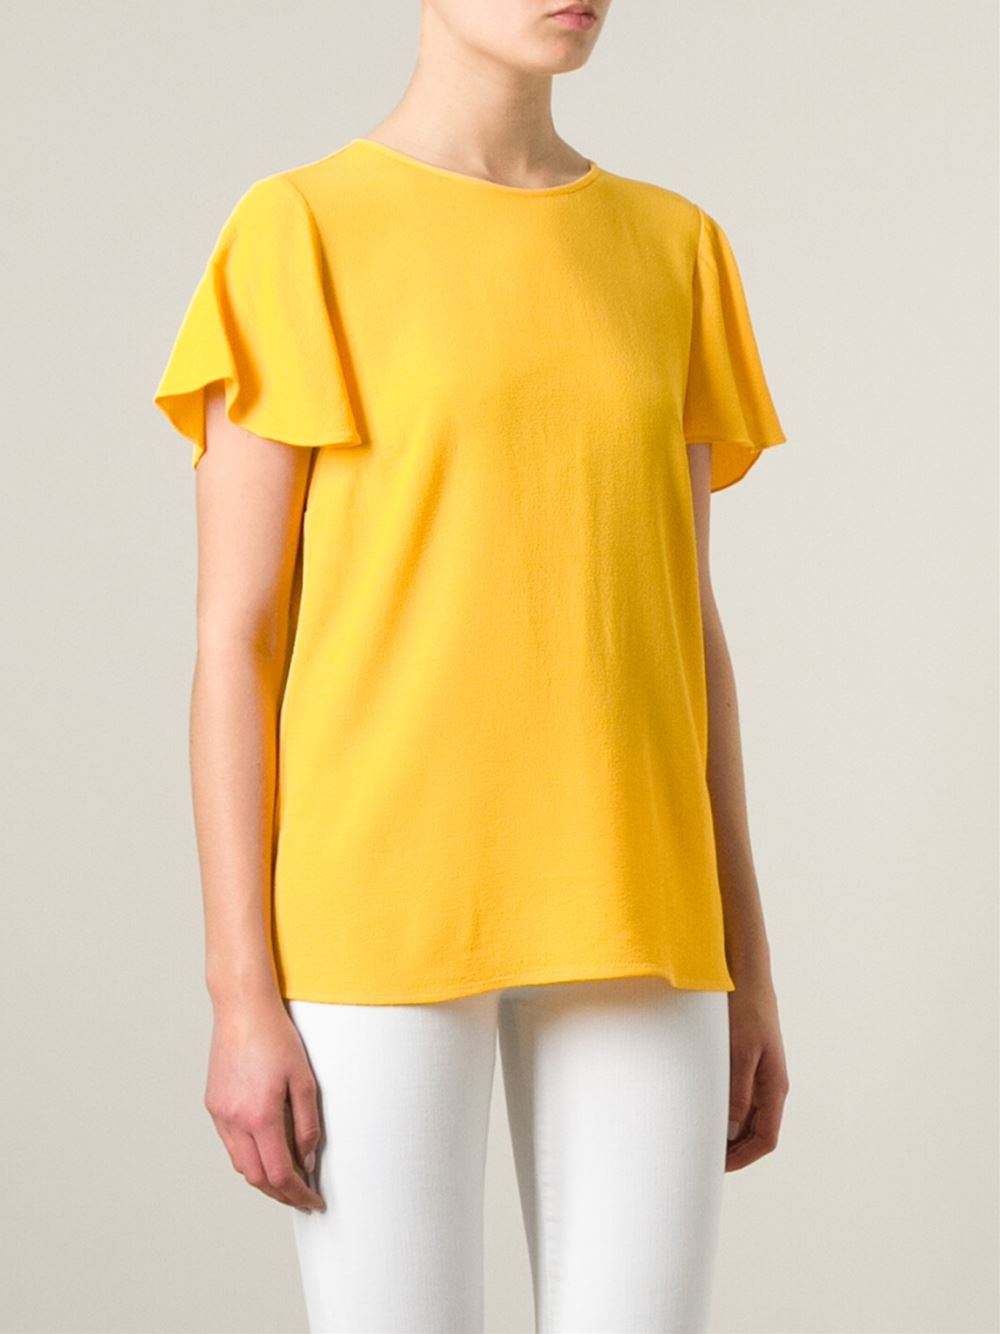 michael michael kors yellow back zip blouse lyst. Black Bedroom Furniture Sets. Home Design Ideas